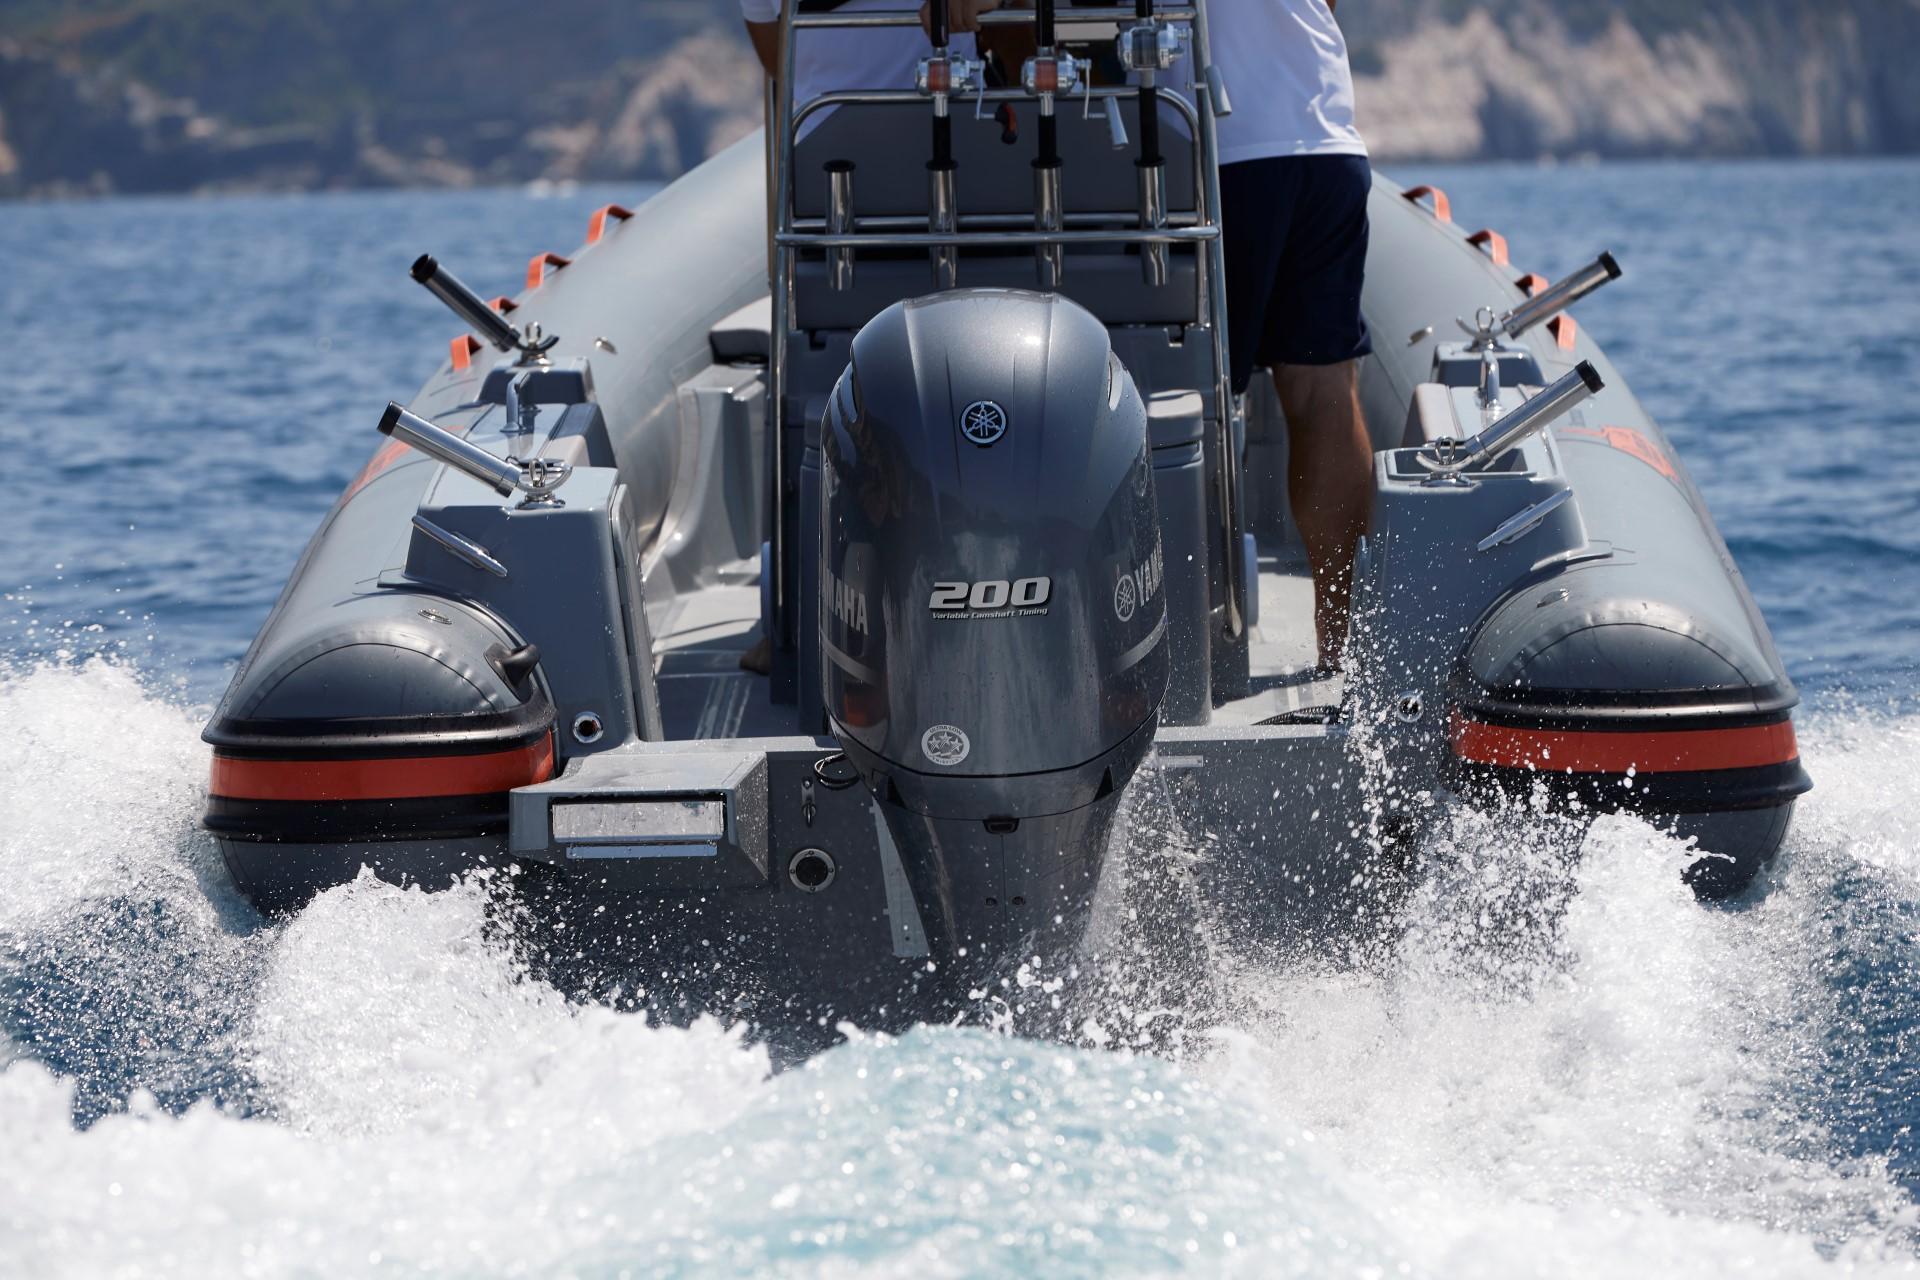 Joker Boat Barracuda yamaha 200